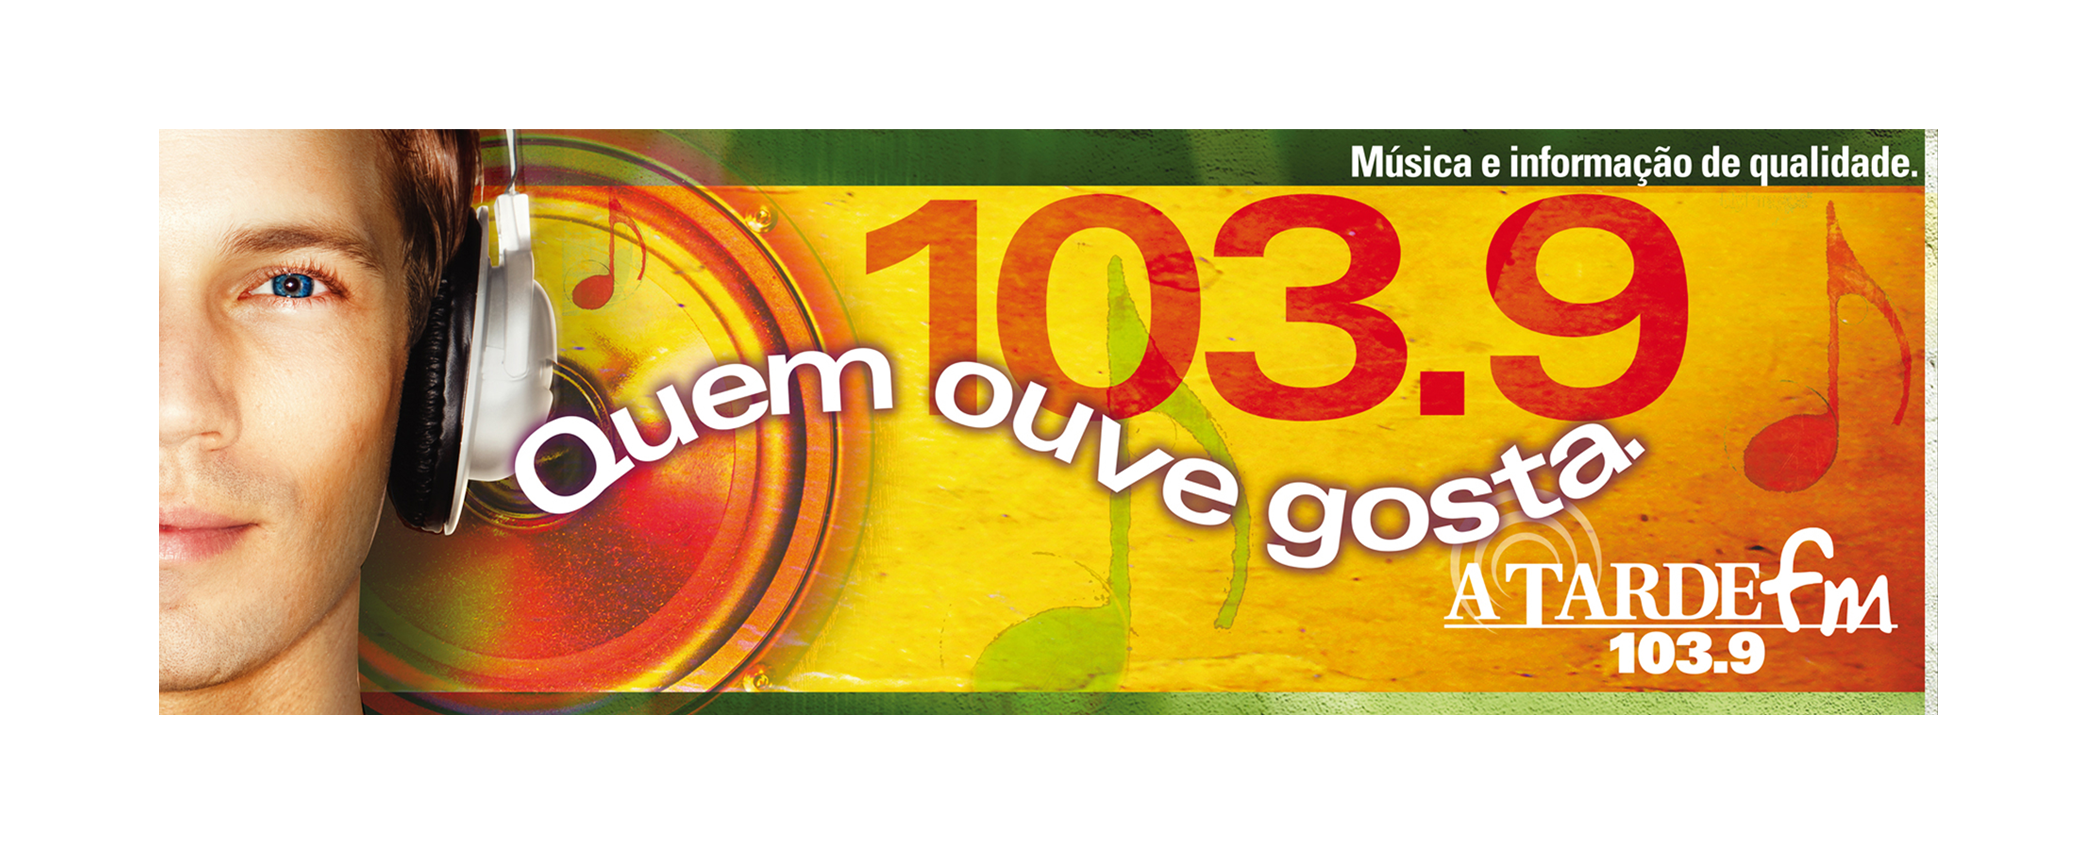 A Tarde FM